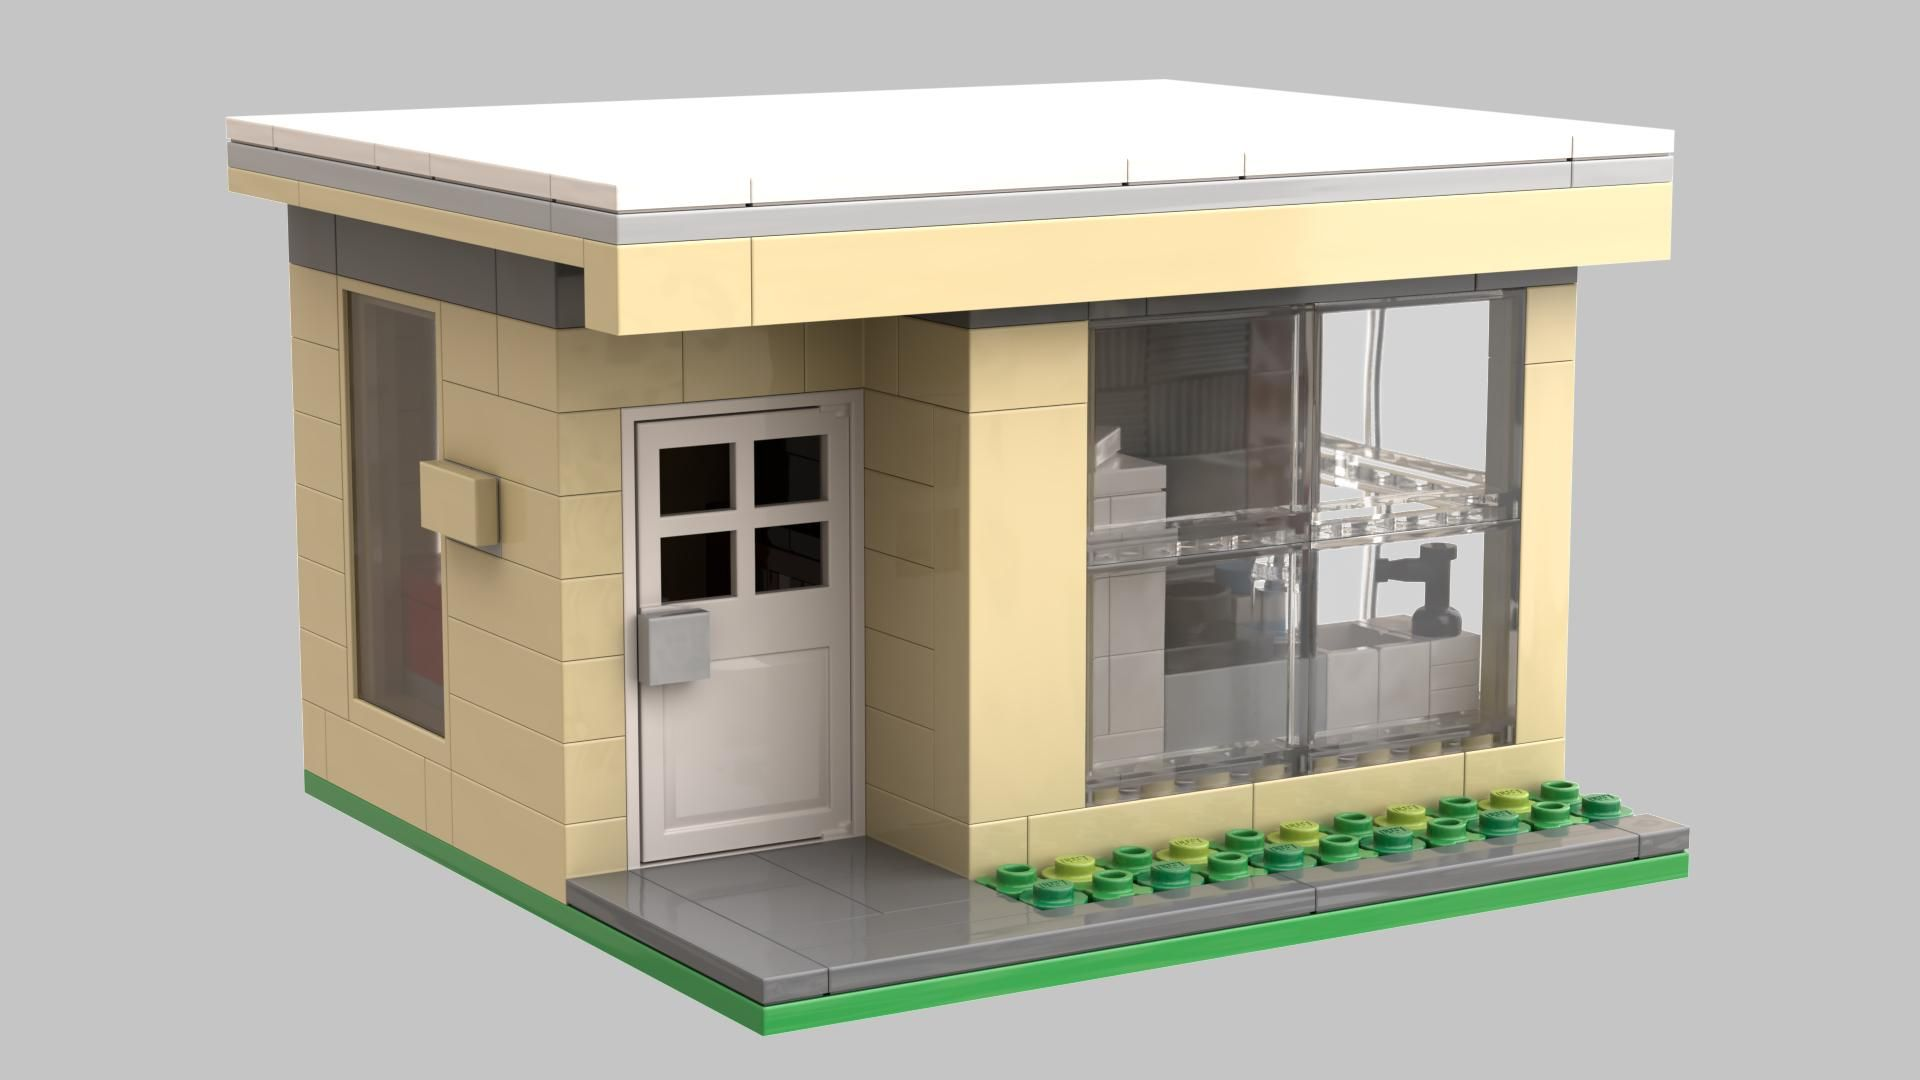 Lego Small Modern House Lego Lego House Small Modern Home Lego